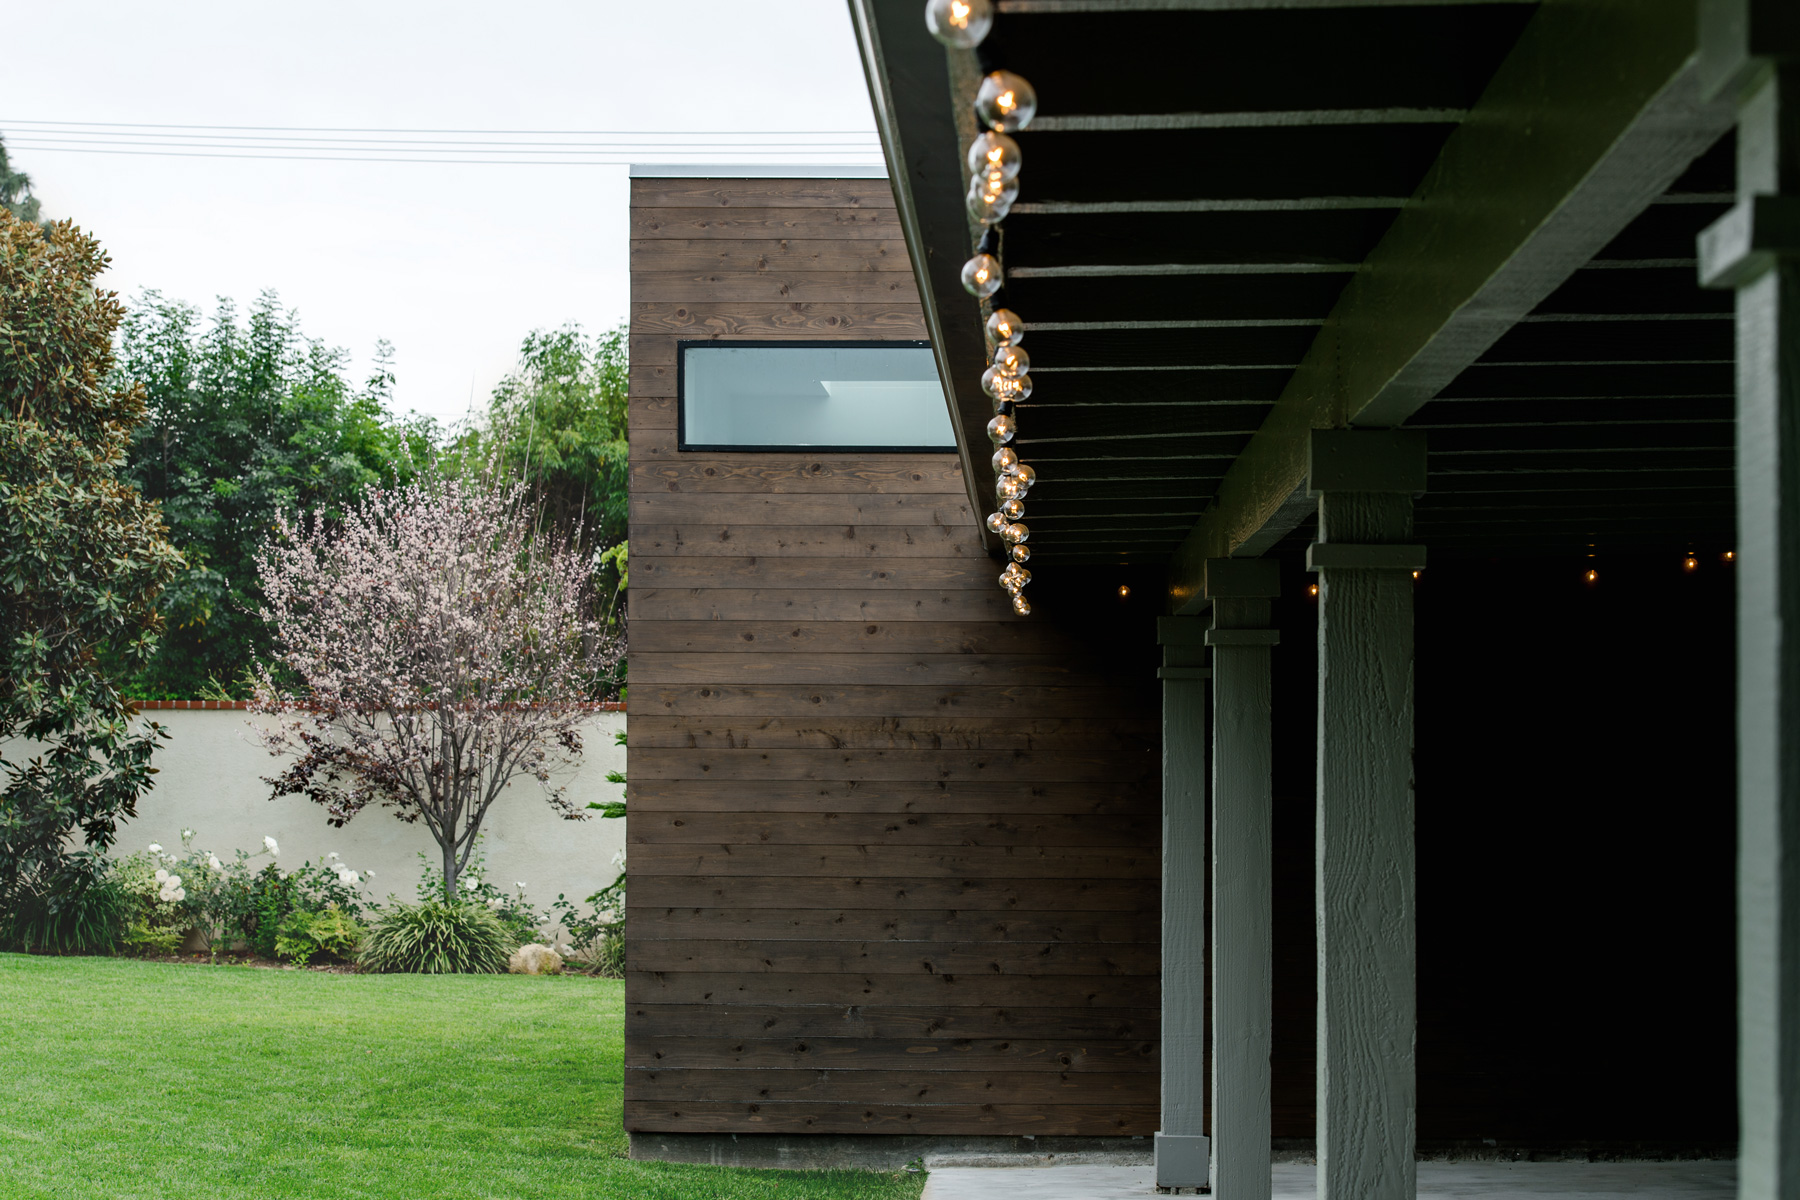 cedar-clad addition at rear